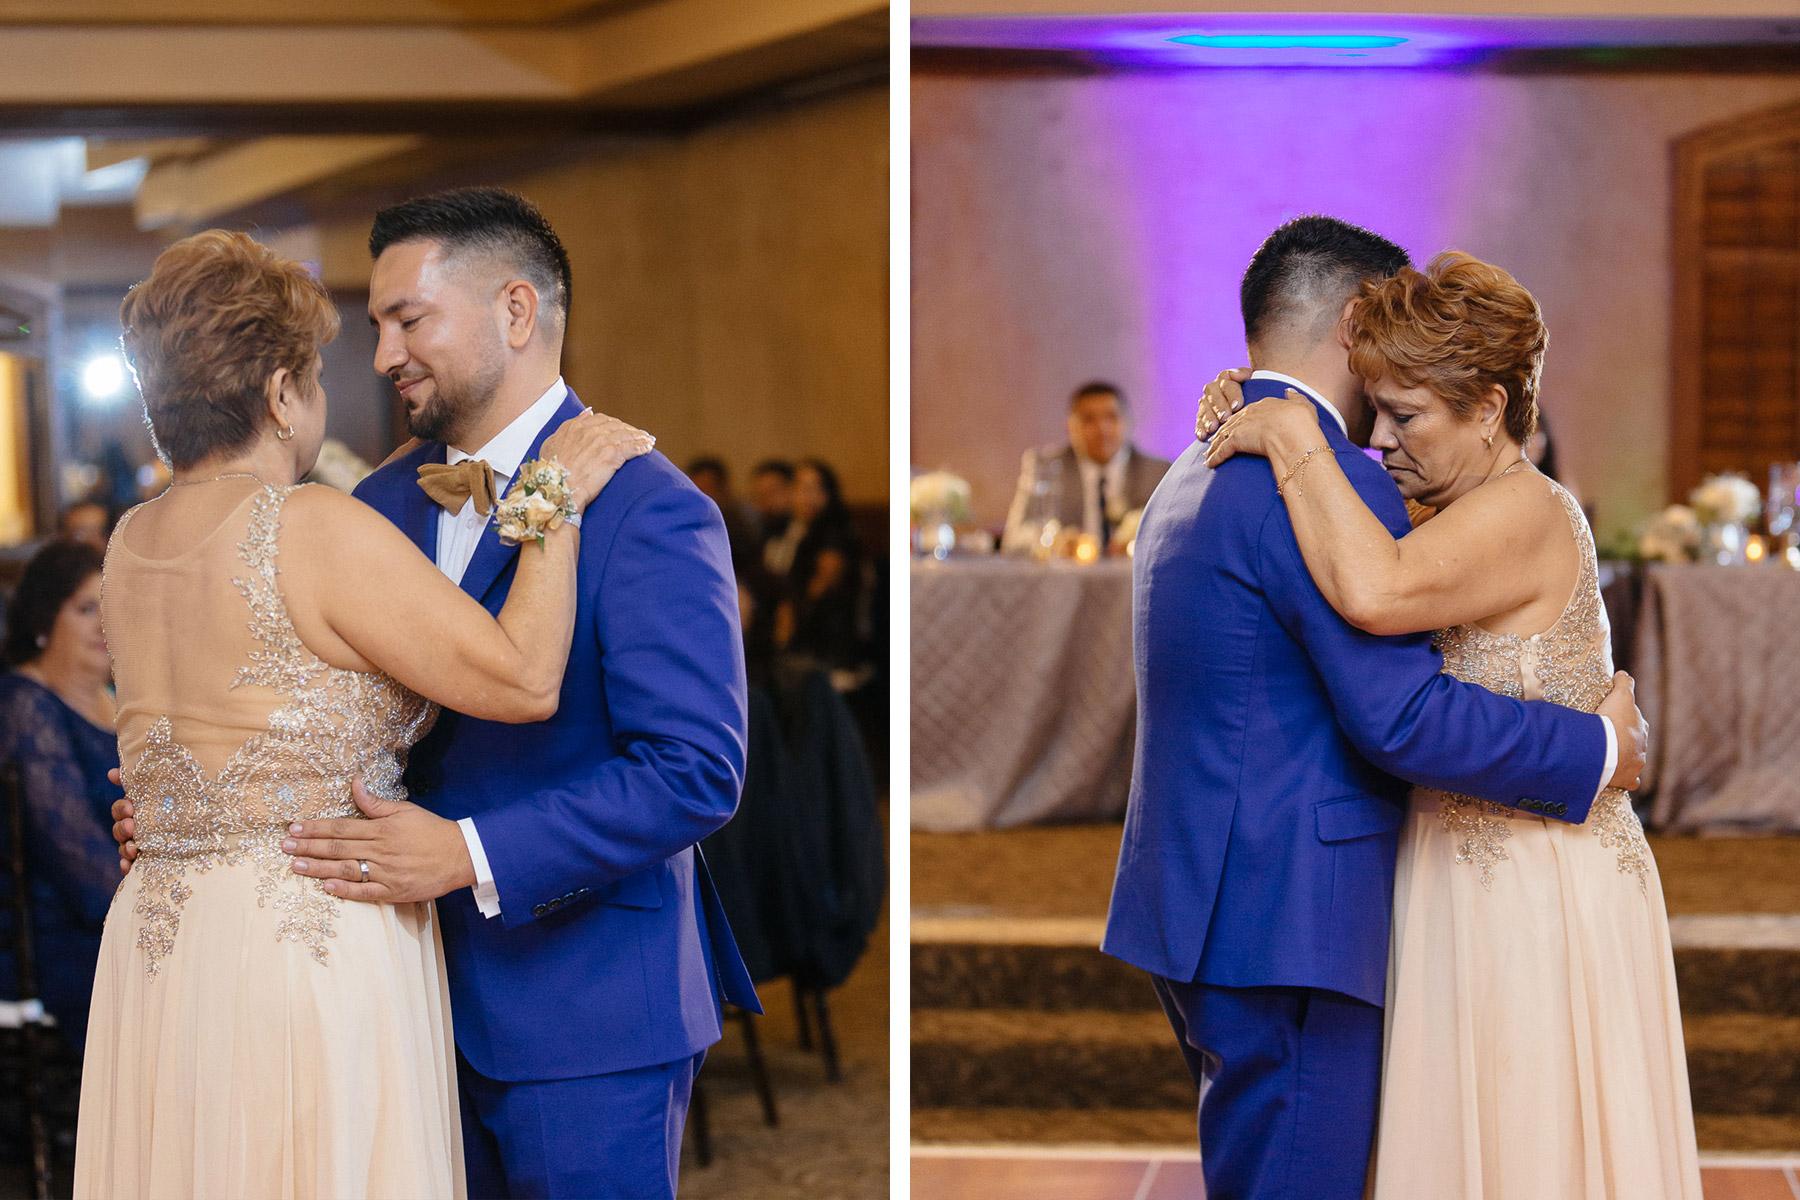 161029-Luxium-Weddings-Arizona-Jeff-Griselda-First-Look-Val-Vista-Lakes-Gilber-080a.jpg